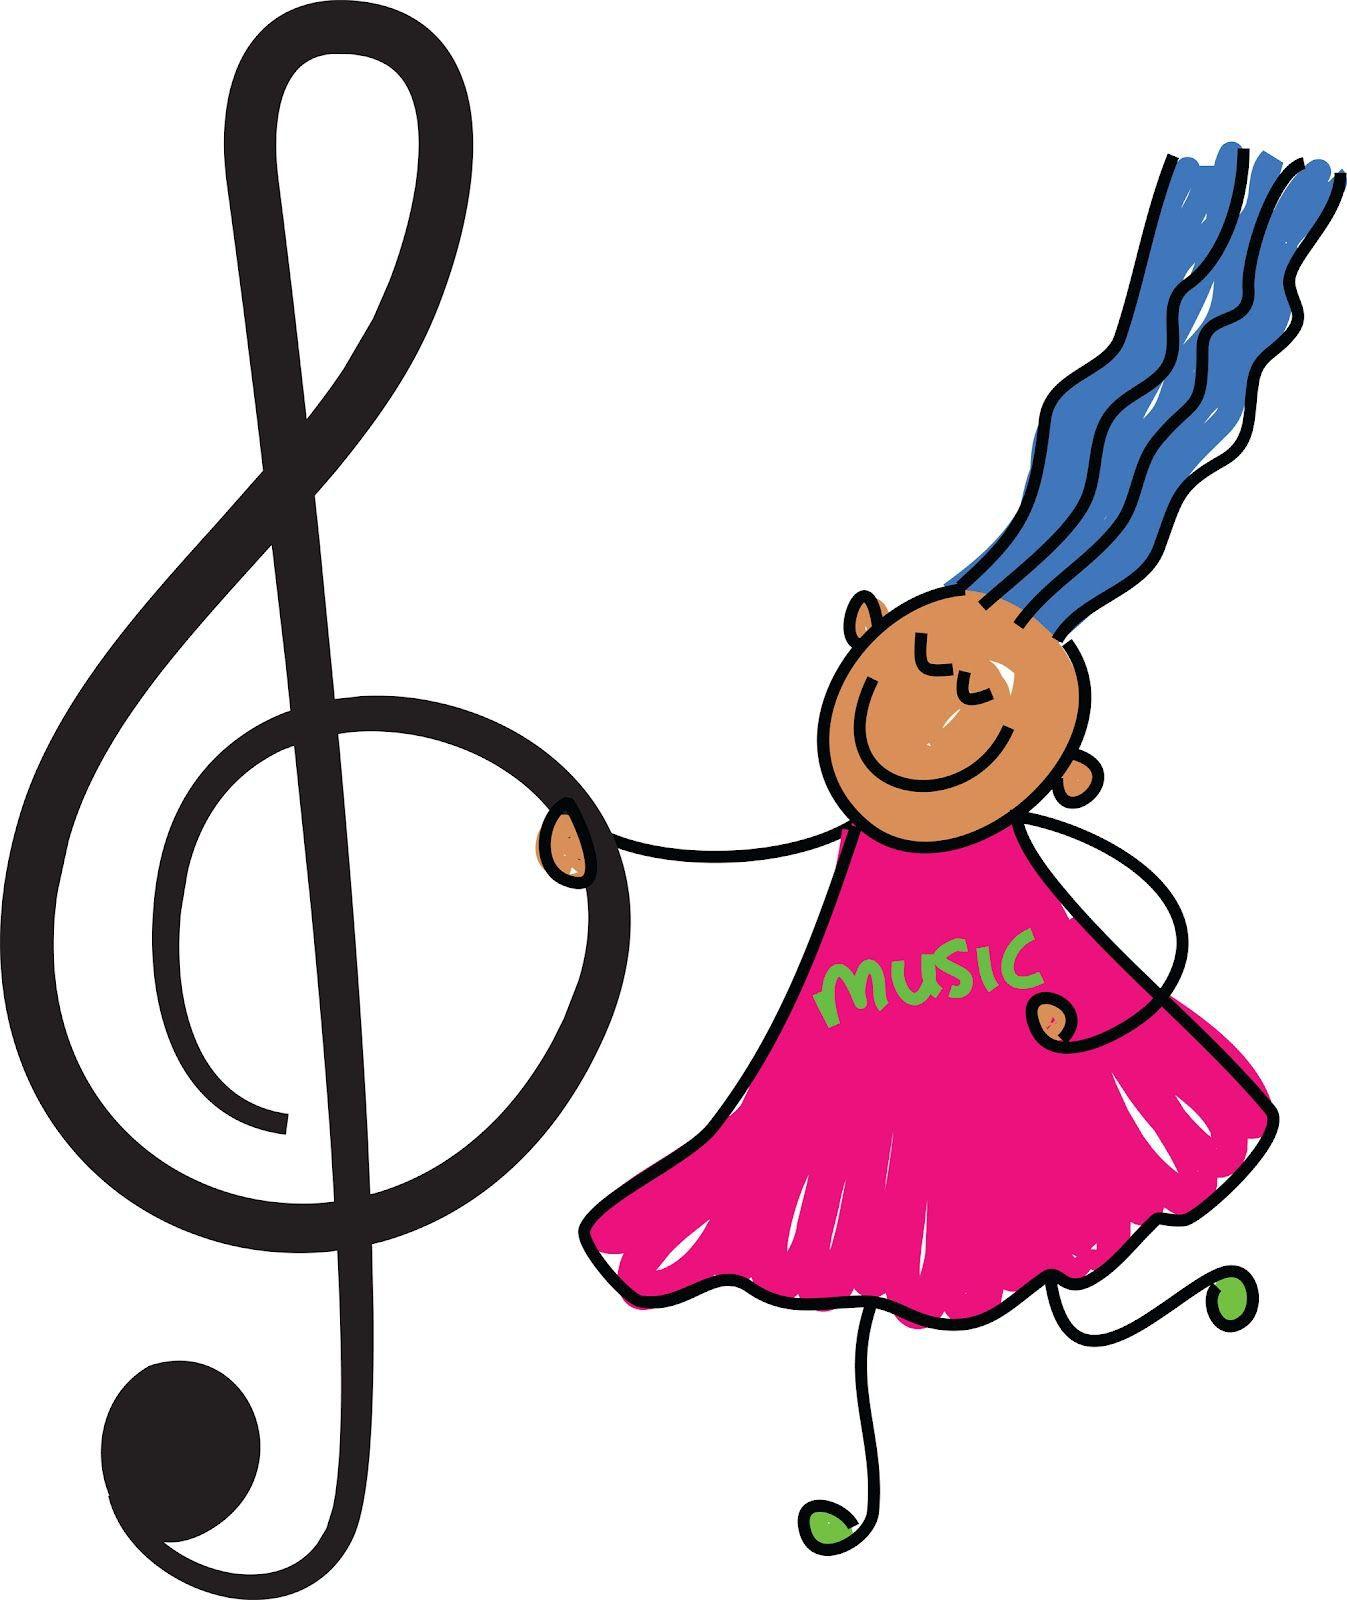 1347x1600 Music Teacher Clipart Elegant Music Clip Art For Kids Tkpurwocom